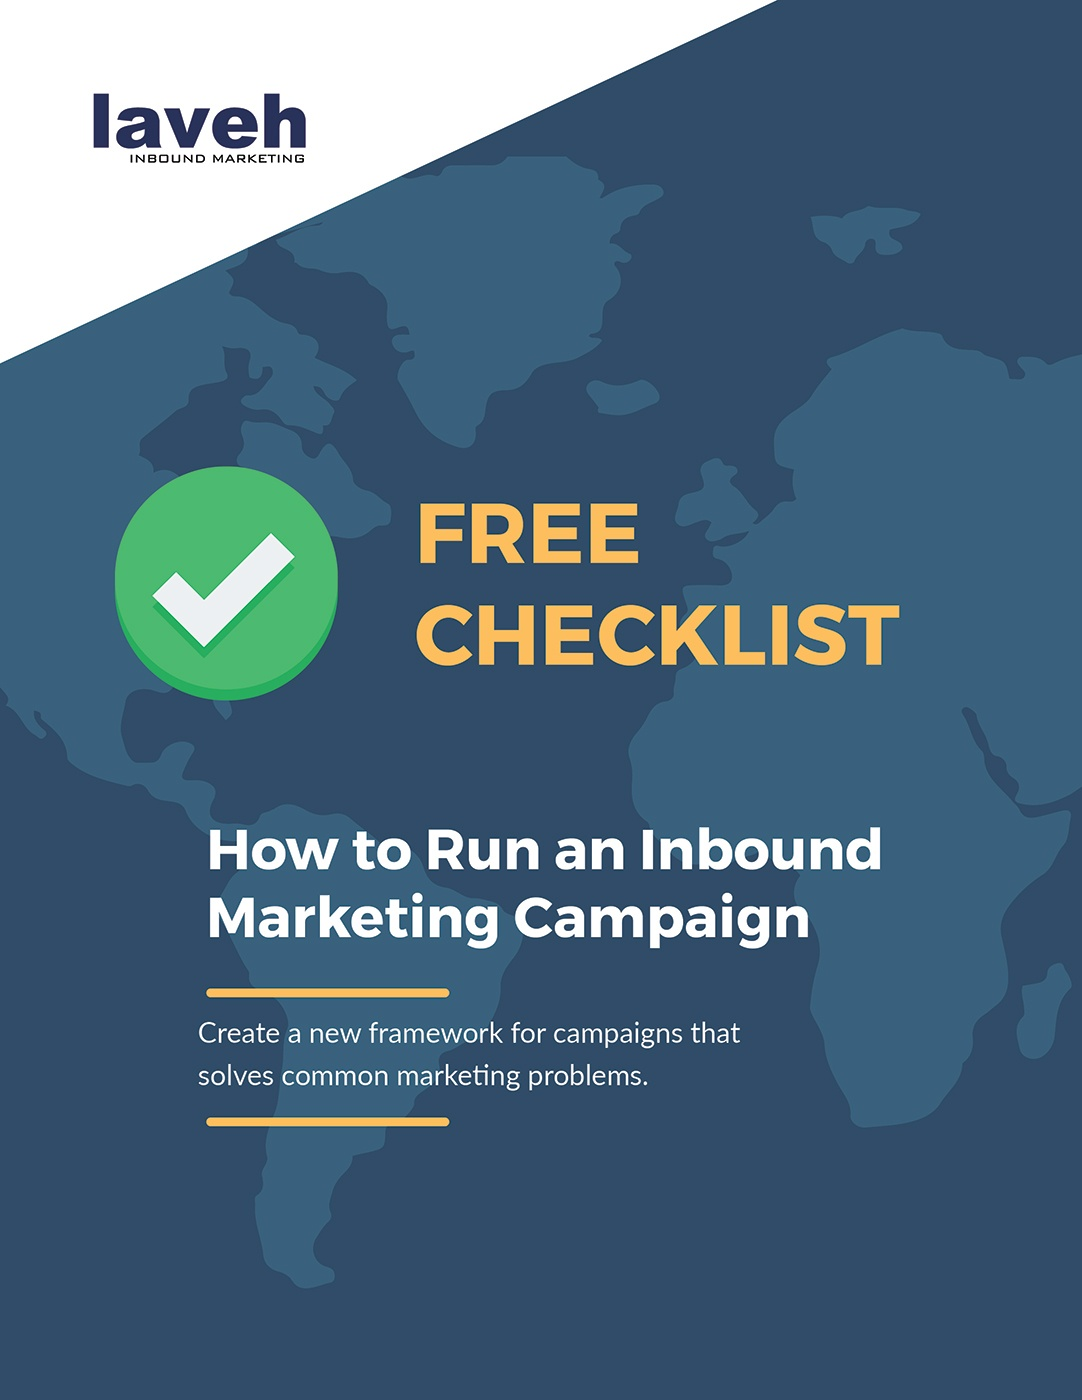 meet marketing campaign objectives -Free-Checklist-Inbound-Marketing-Campaign.jpg